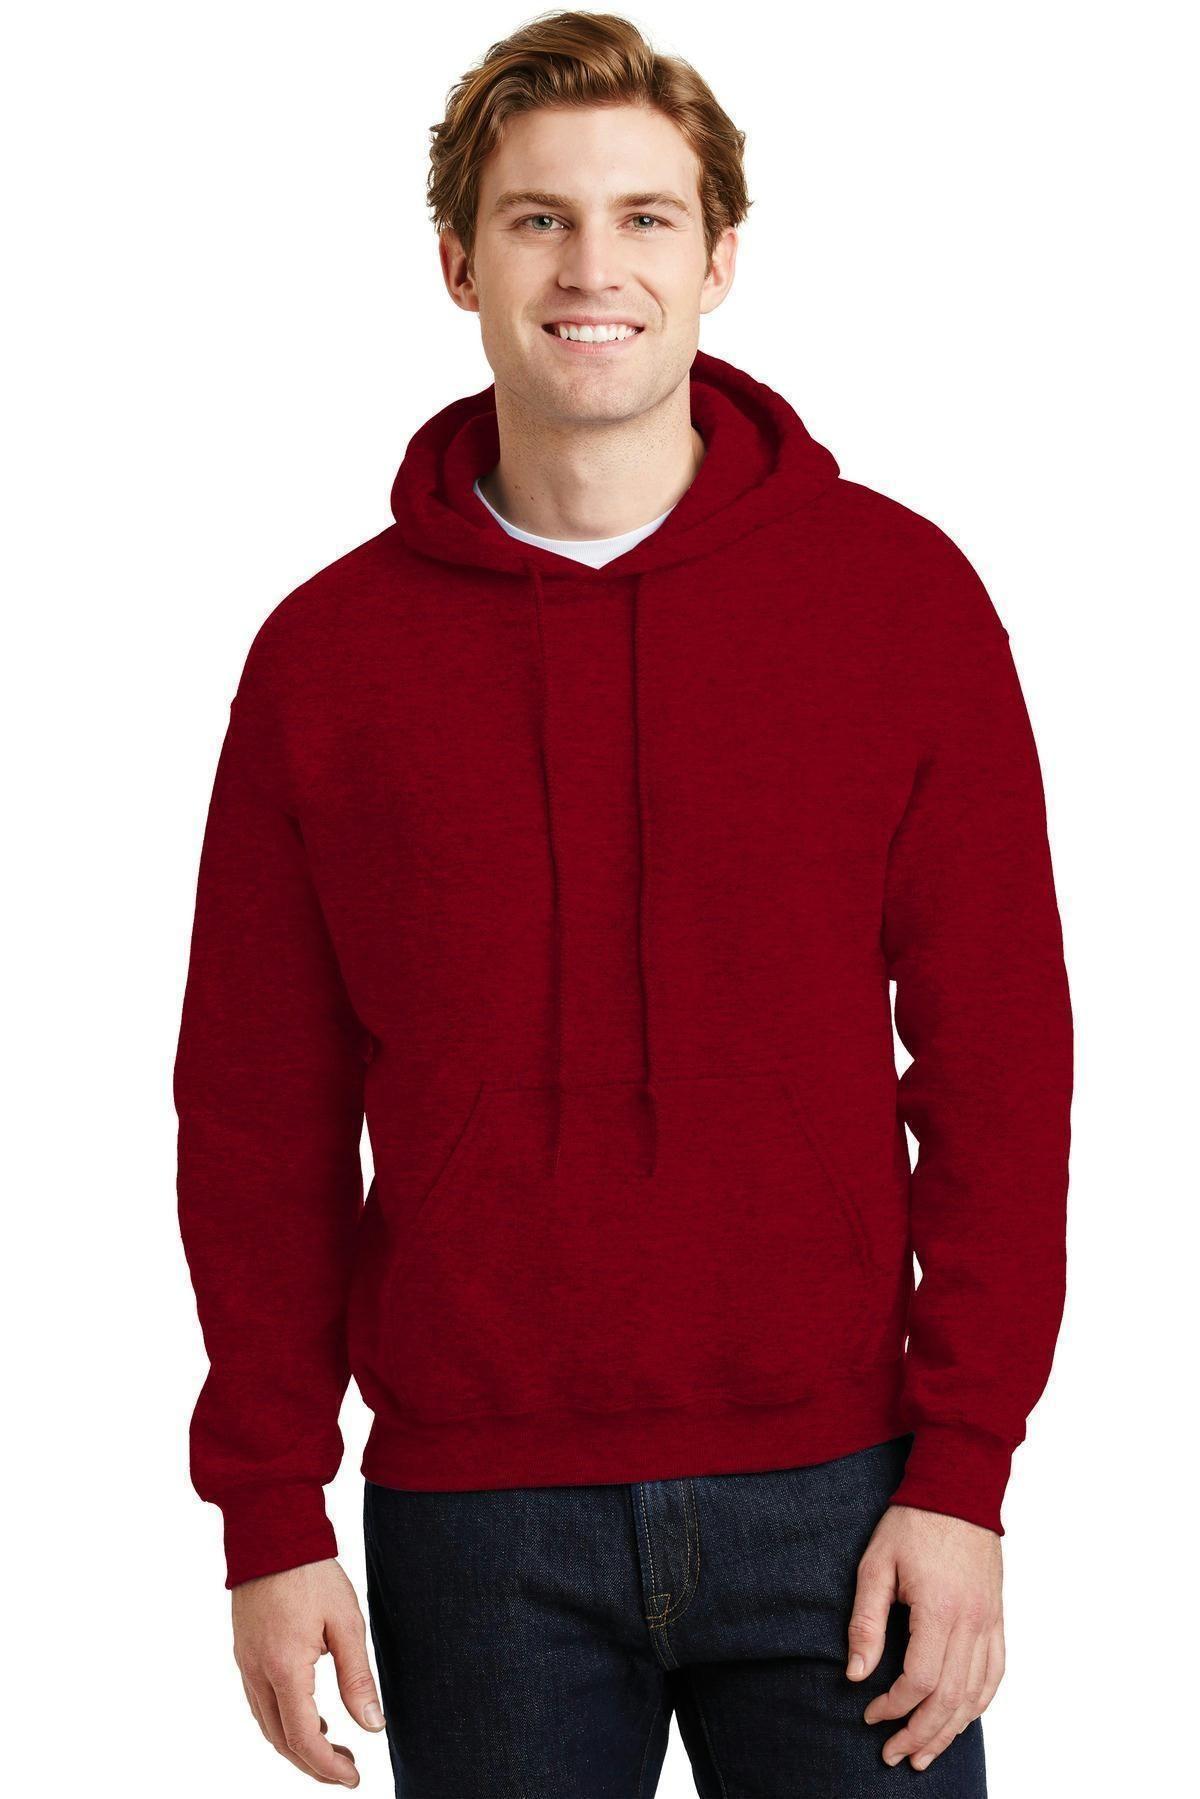 Antique Cherry S Gildan Heavy Blend Hooded Sweatshirt